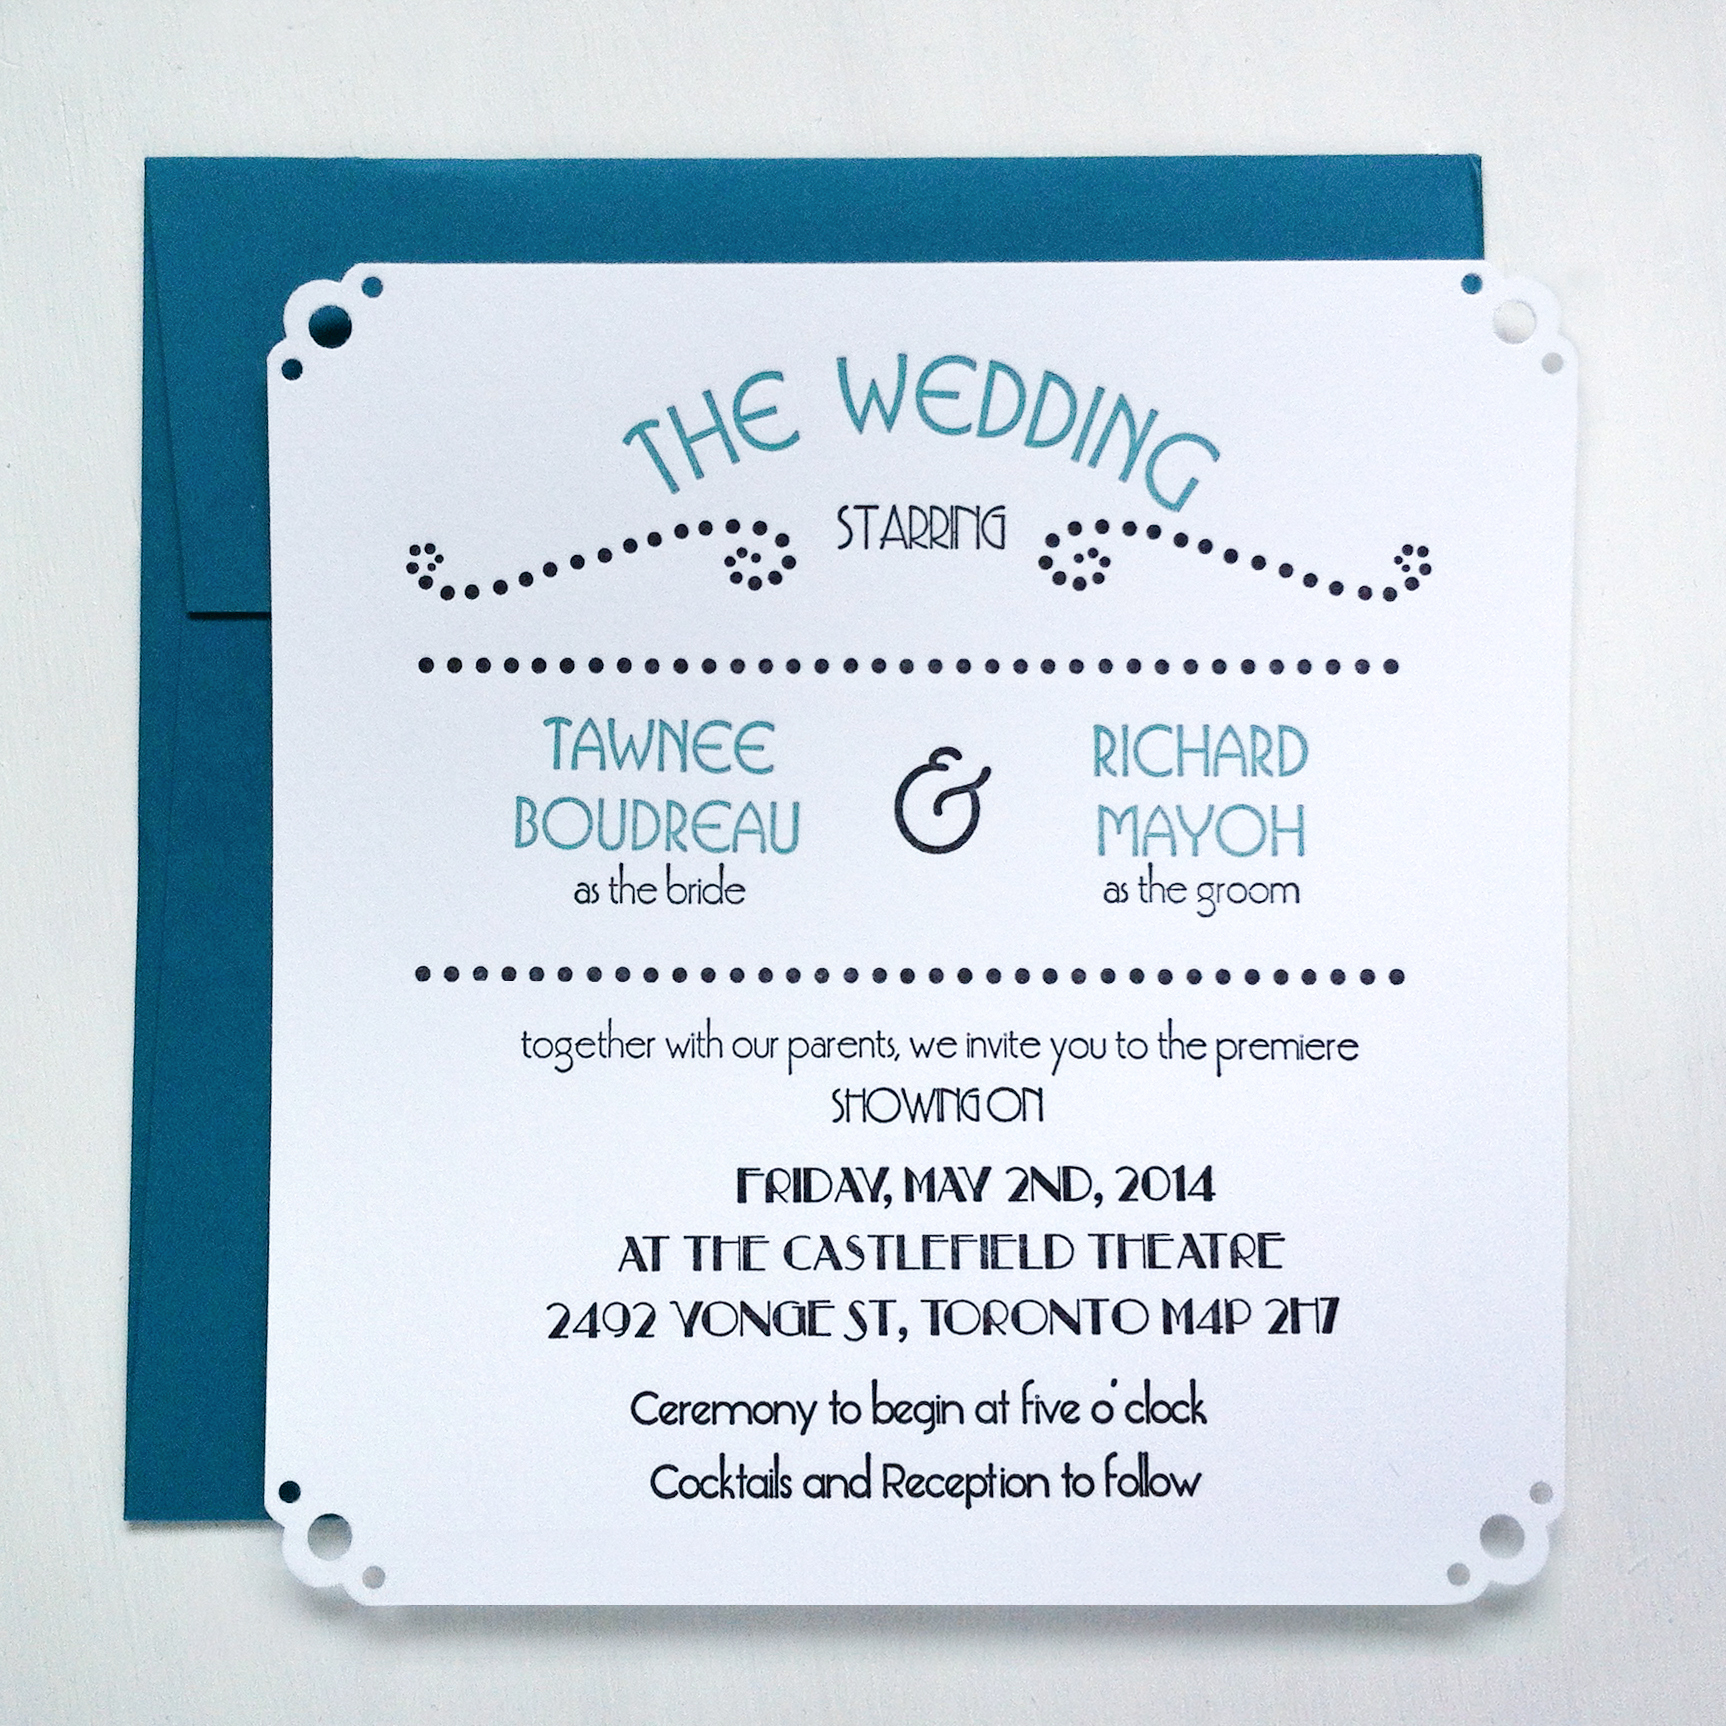 teal_black_wedding_invitation_full_letterpress.jpg